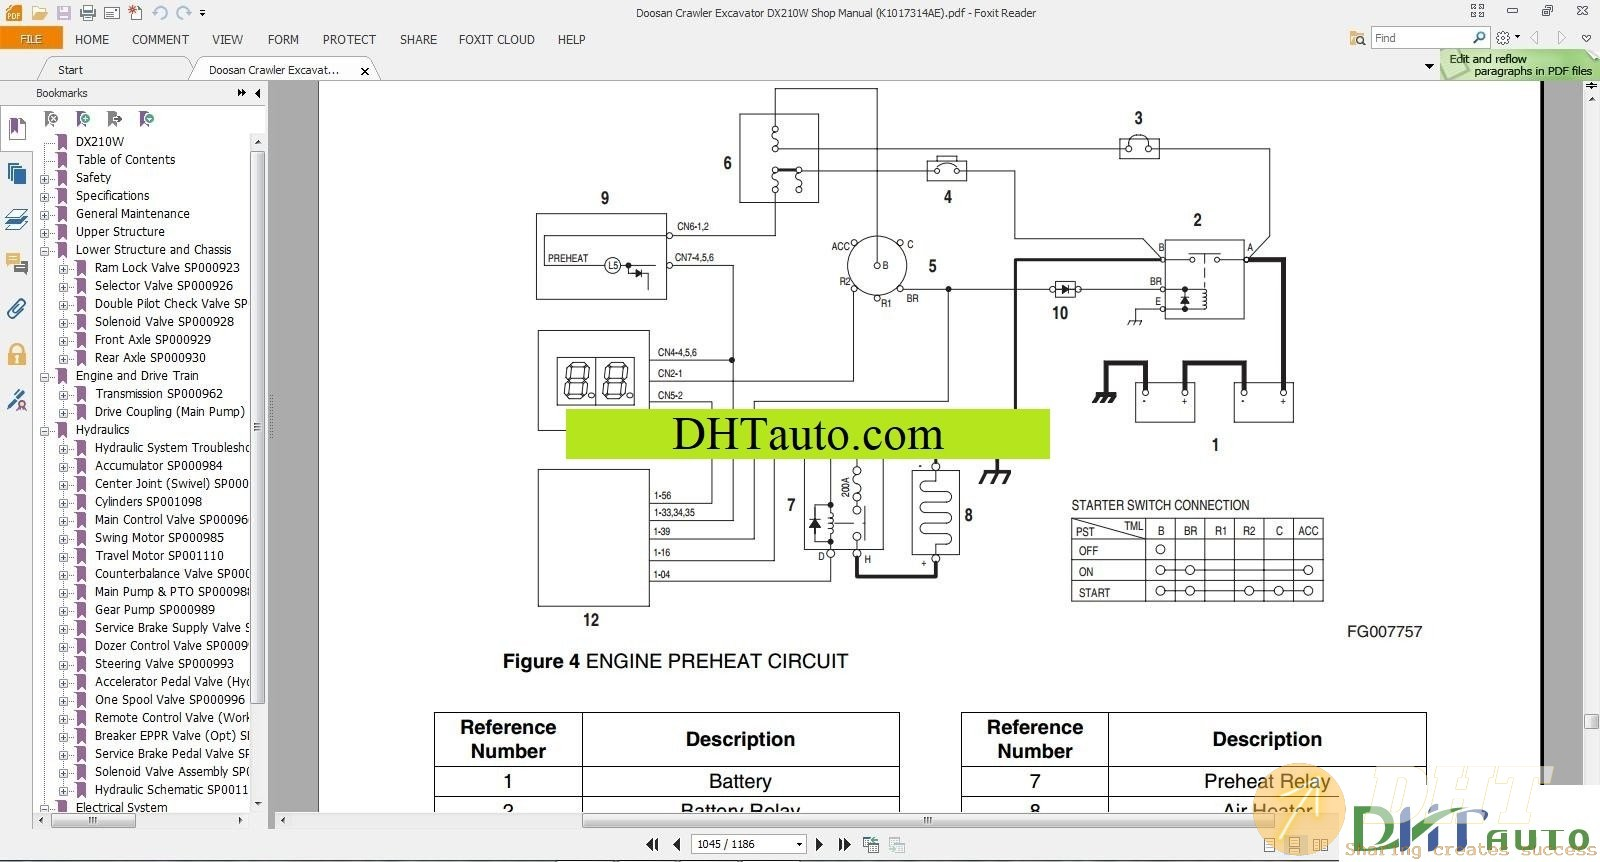 Doosan DX Workshop Manual Full 9.jpg